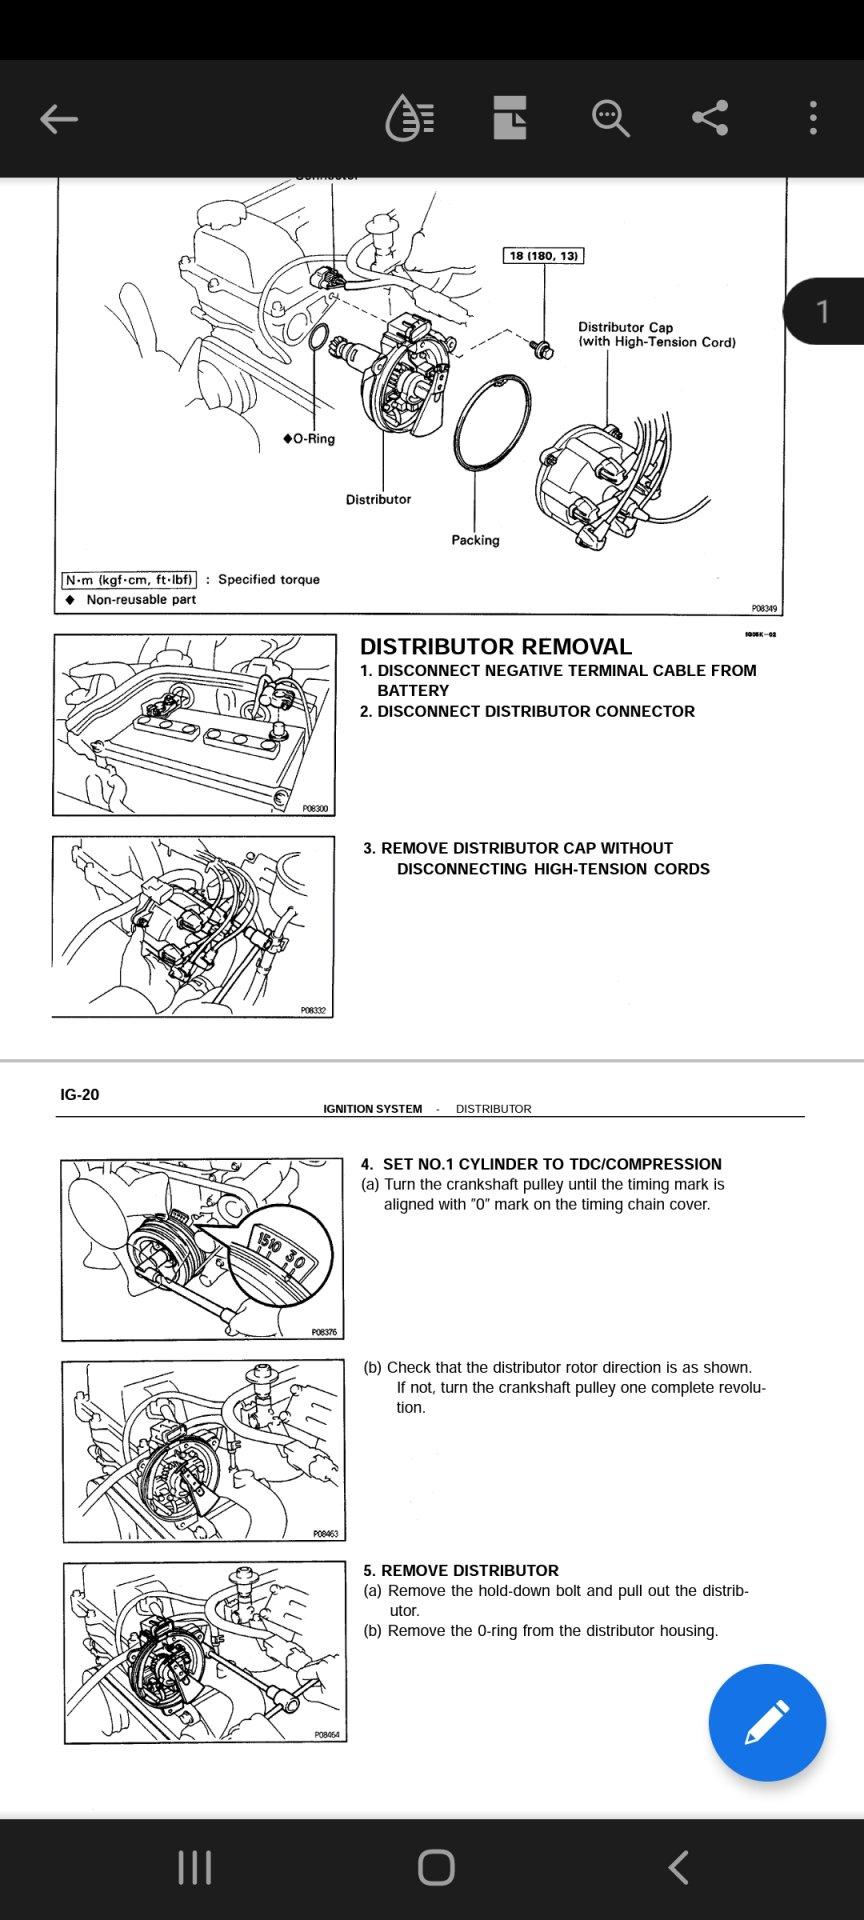 Screenshot_20210523-210324_Acrobat for Samsung.jpg